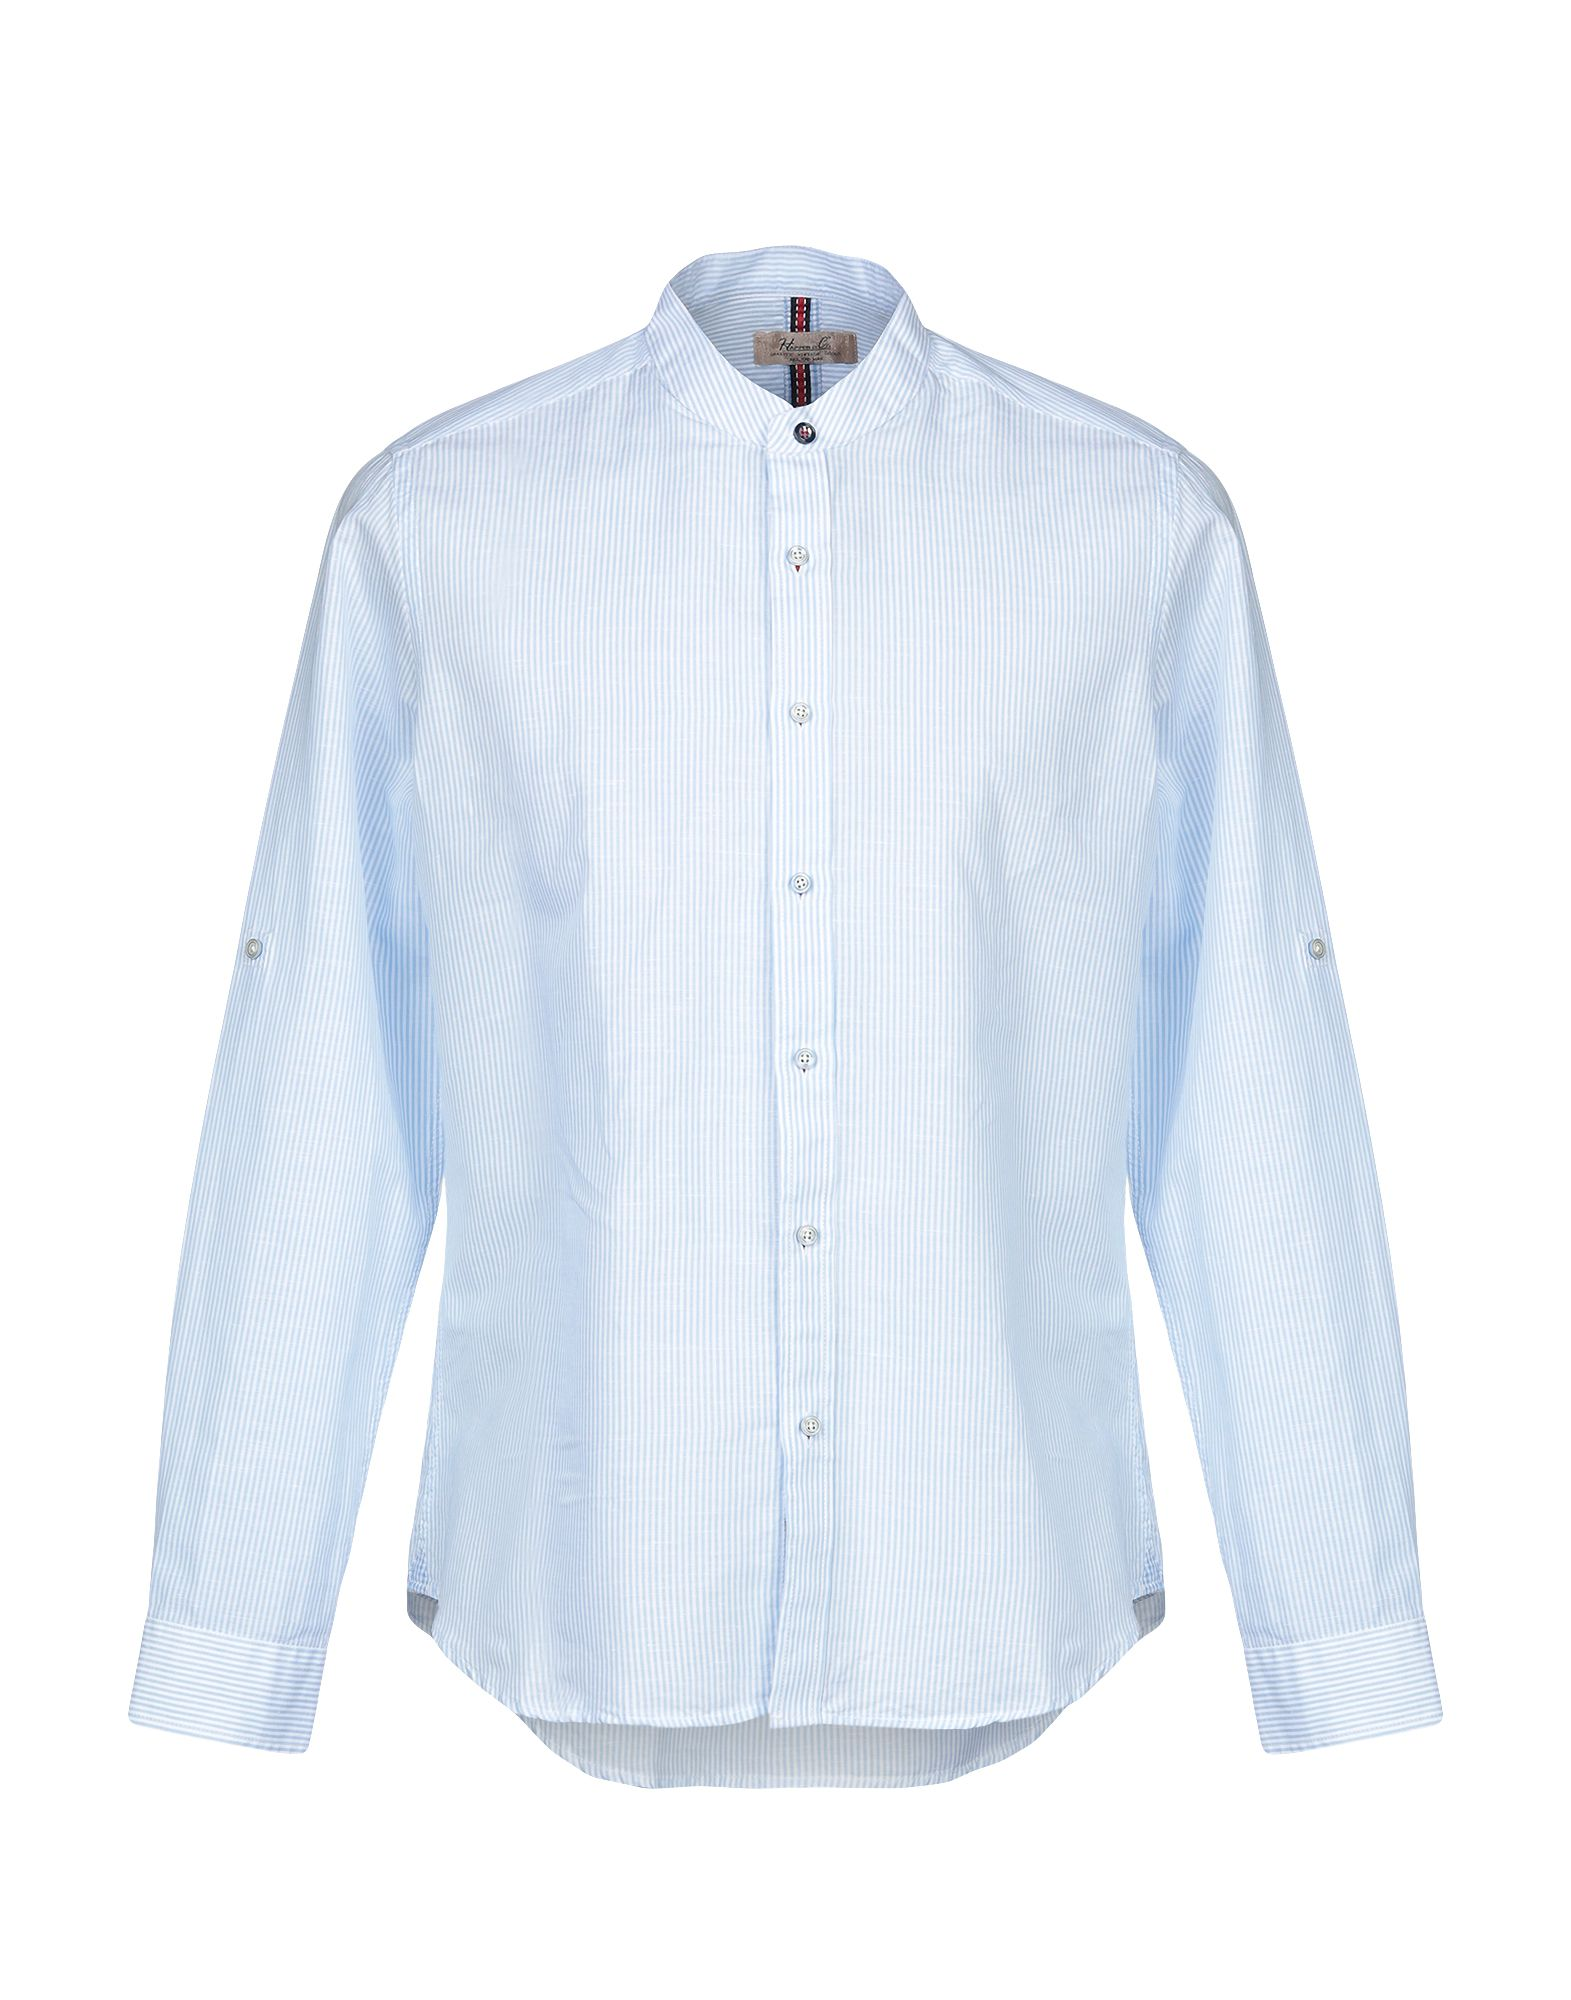 HAPPER & CO Pубашка стоимость